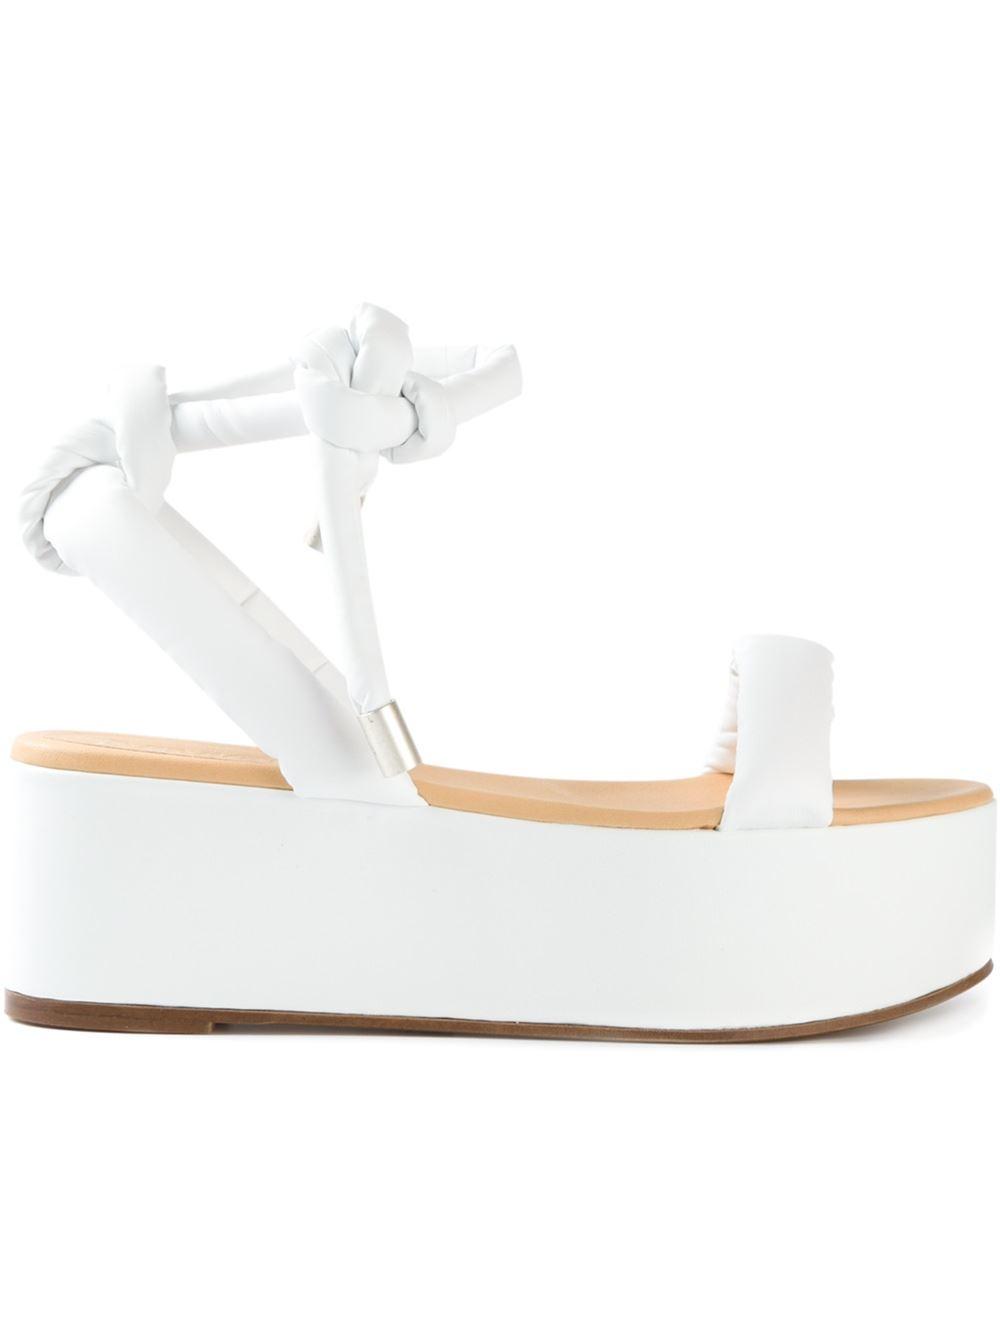 97d11d5be66 Lyst - MM6 by Maison Martin Margiela Flat Platform Sandals in White